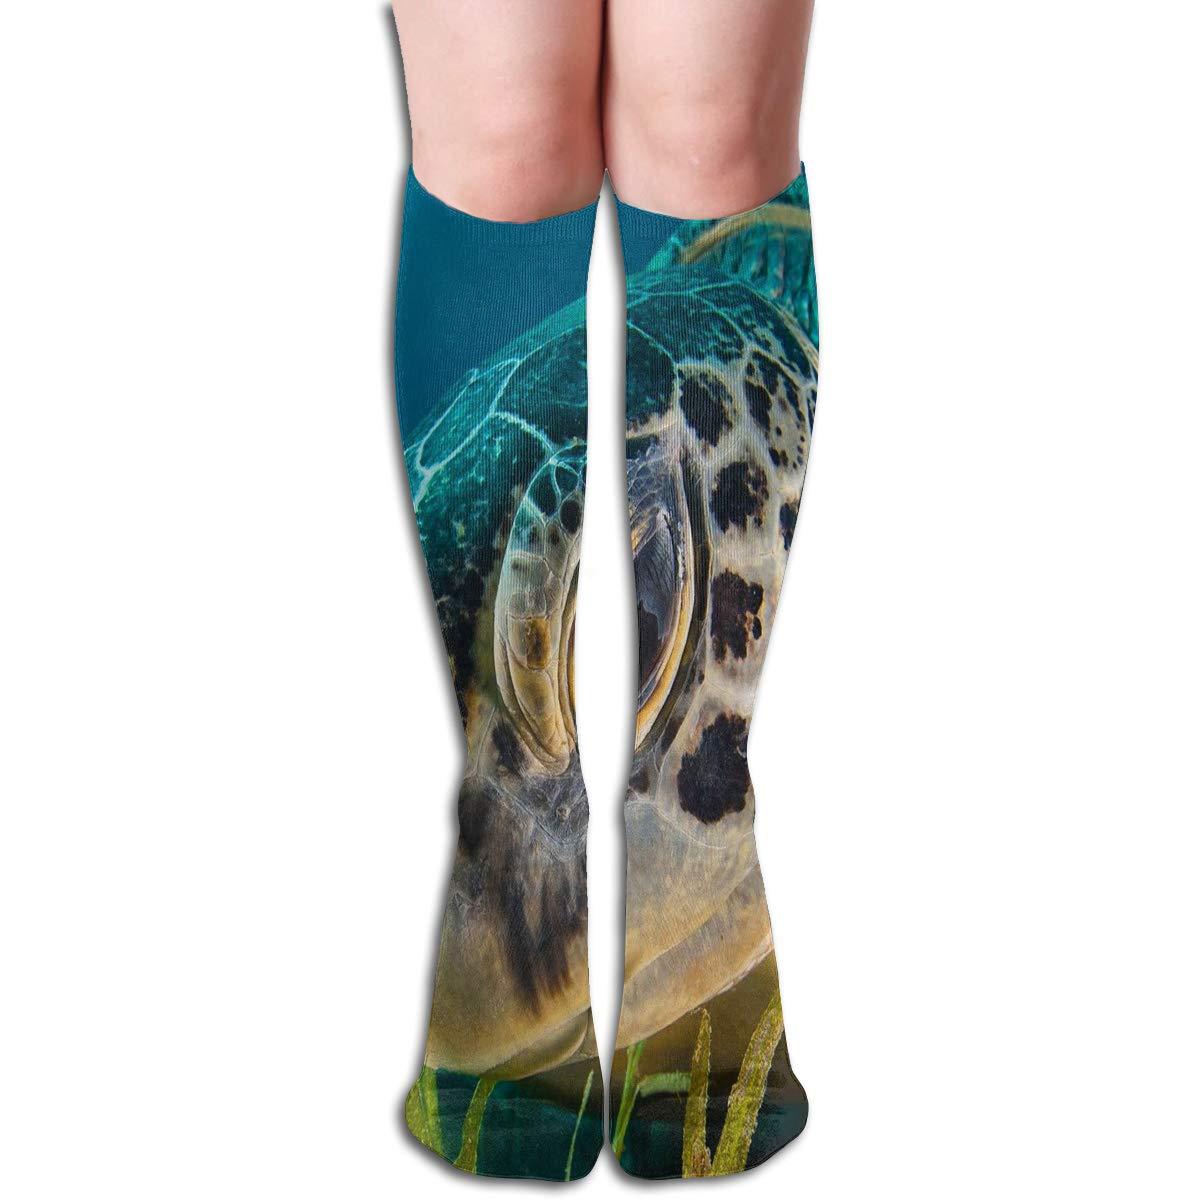 Girls Socks Over Knee Sea Turtles Images Winter Amazing For Festive